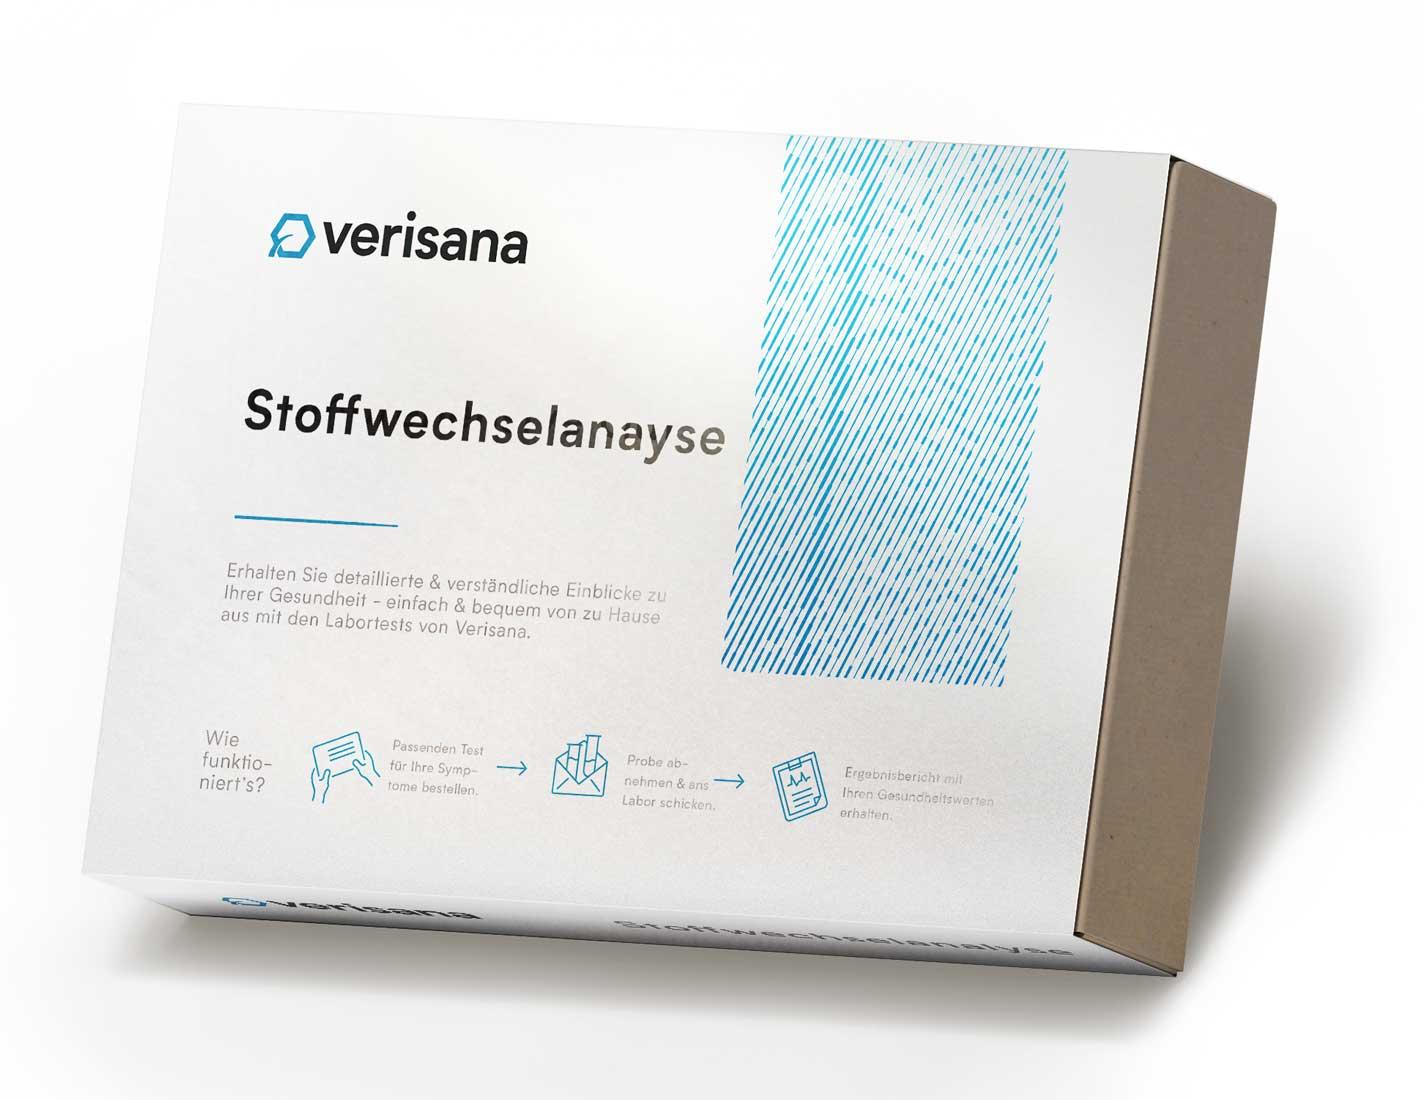 Stoffwechselanalyse, Schwermetallanalyse, Haarmineralanalyse